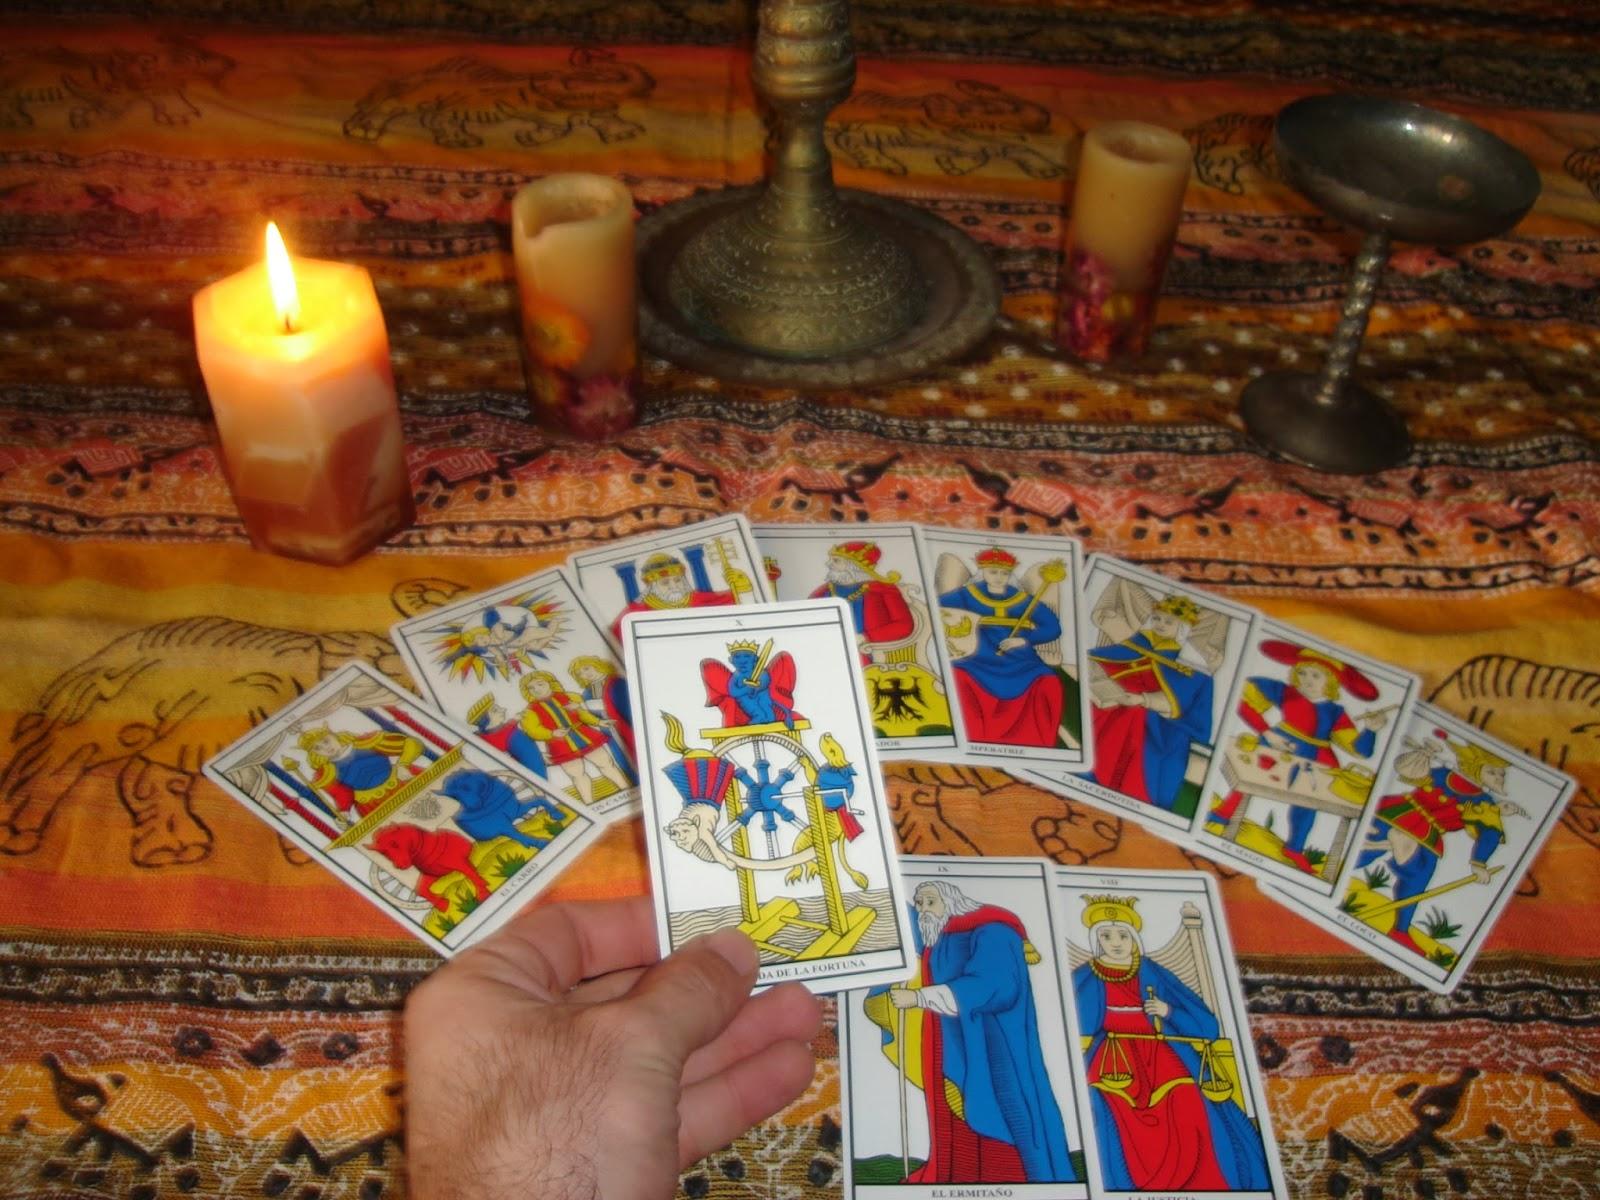 Cuento, #relato, brujos, tarot